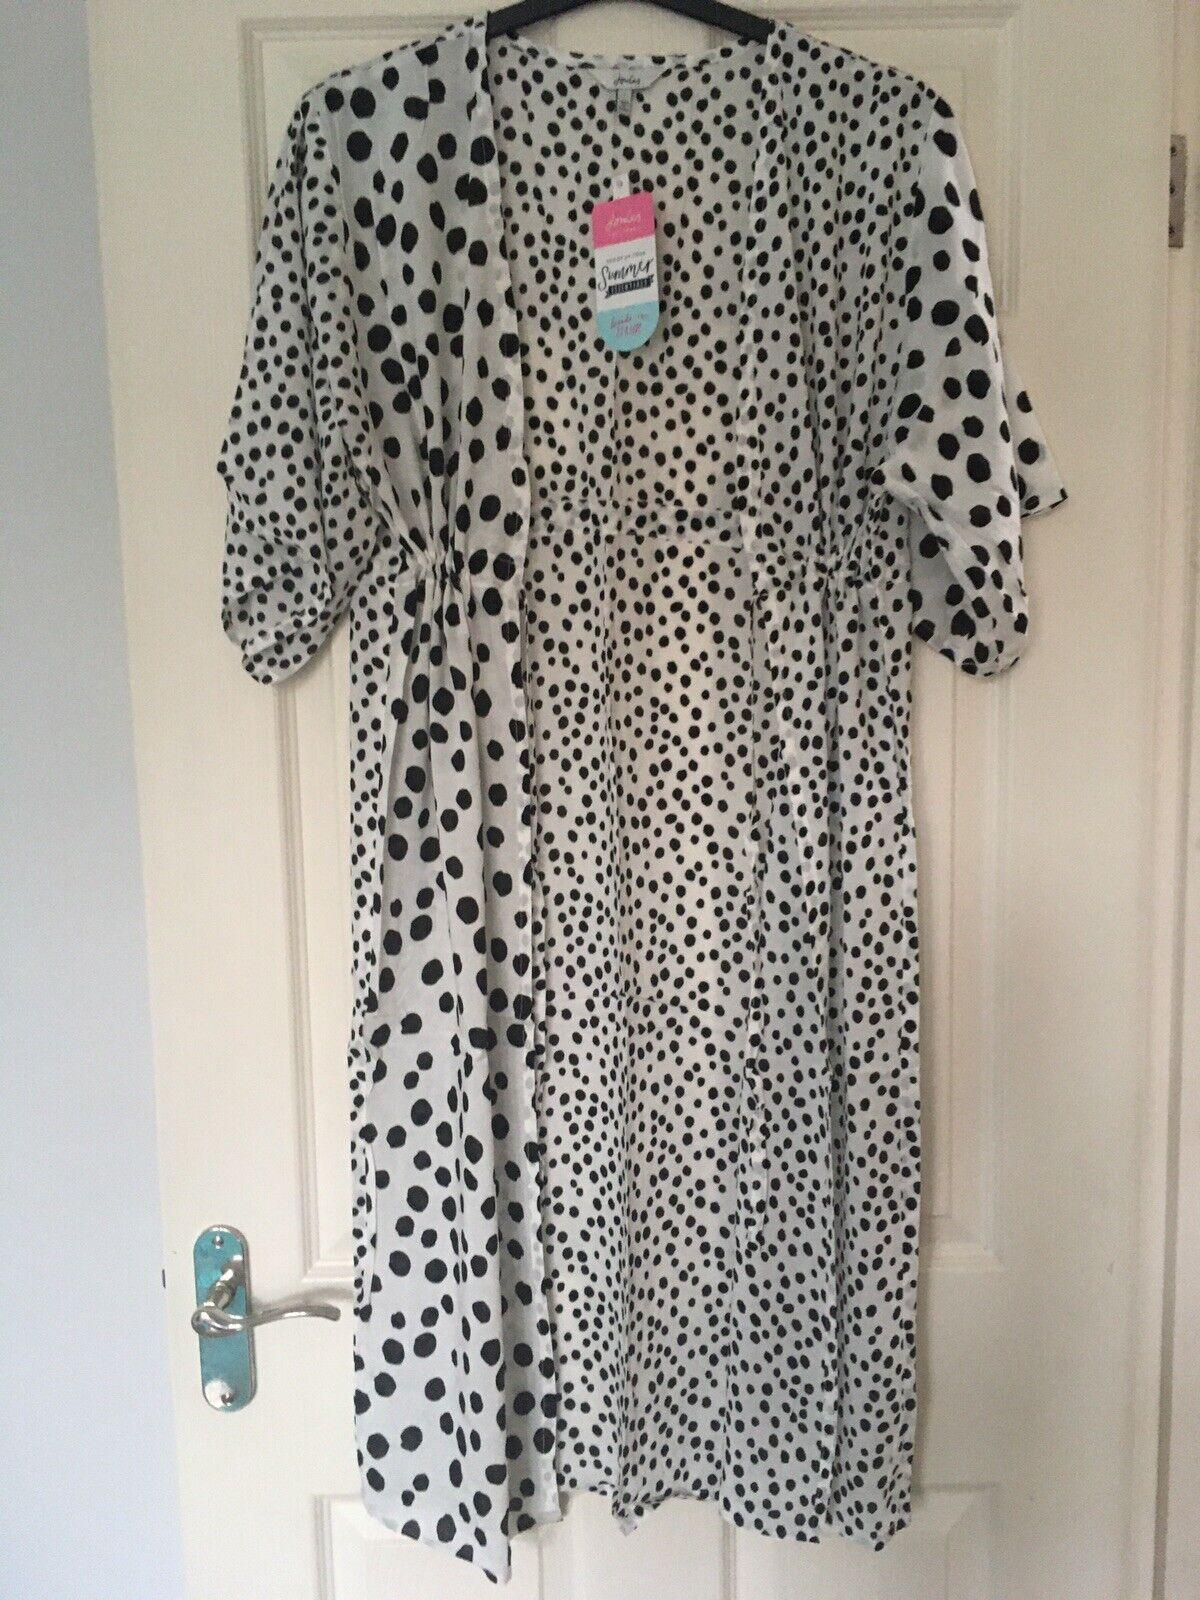 Joules Womens Tie Waist Cover Up - Dalmatian Spot - S BNWT